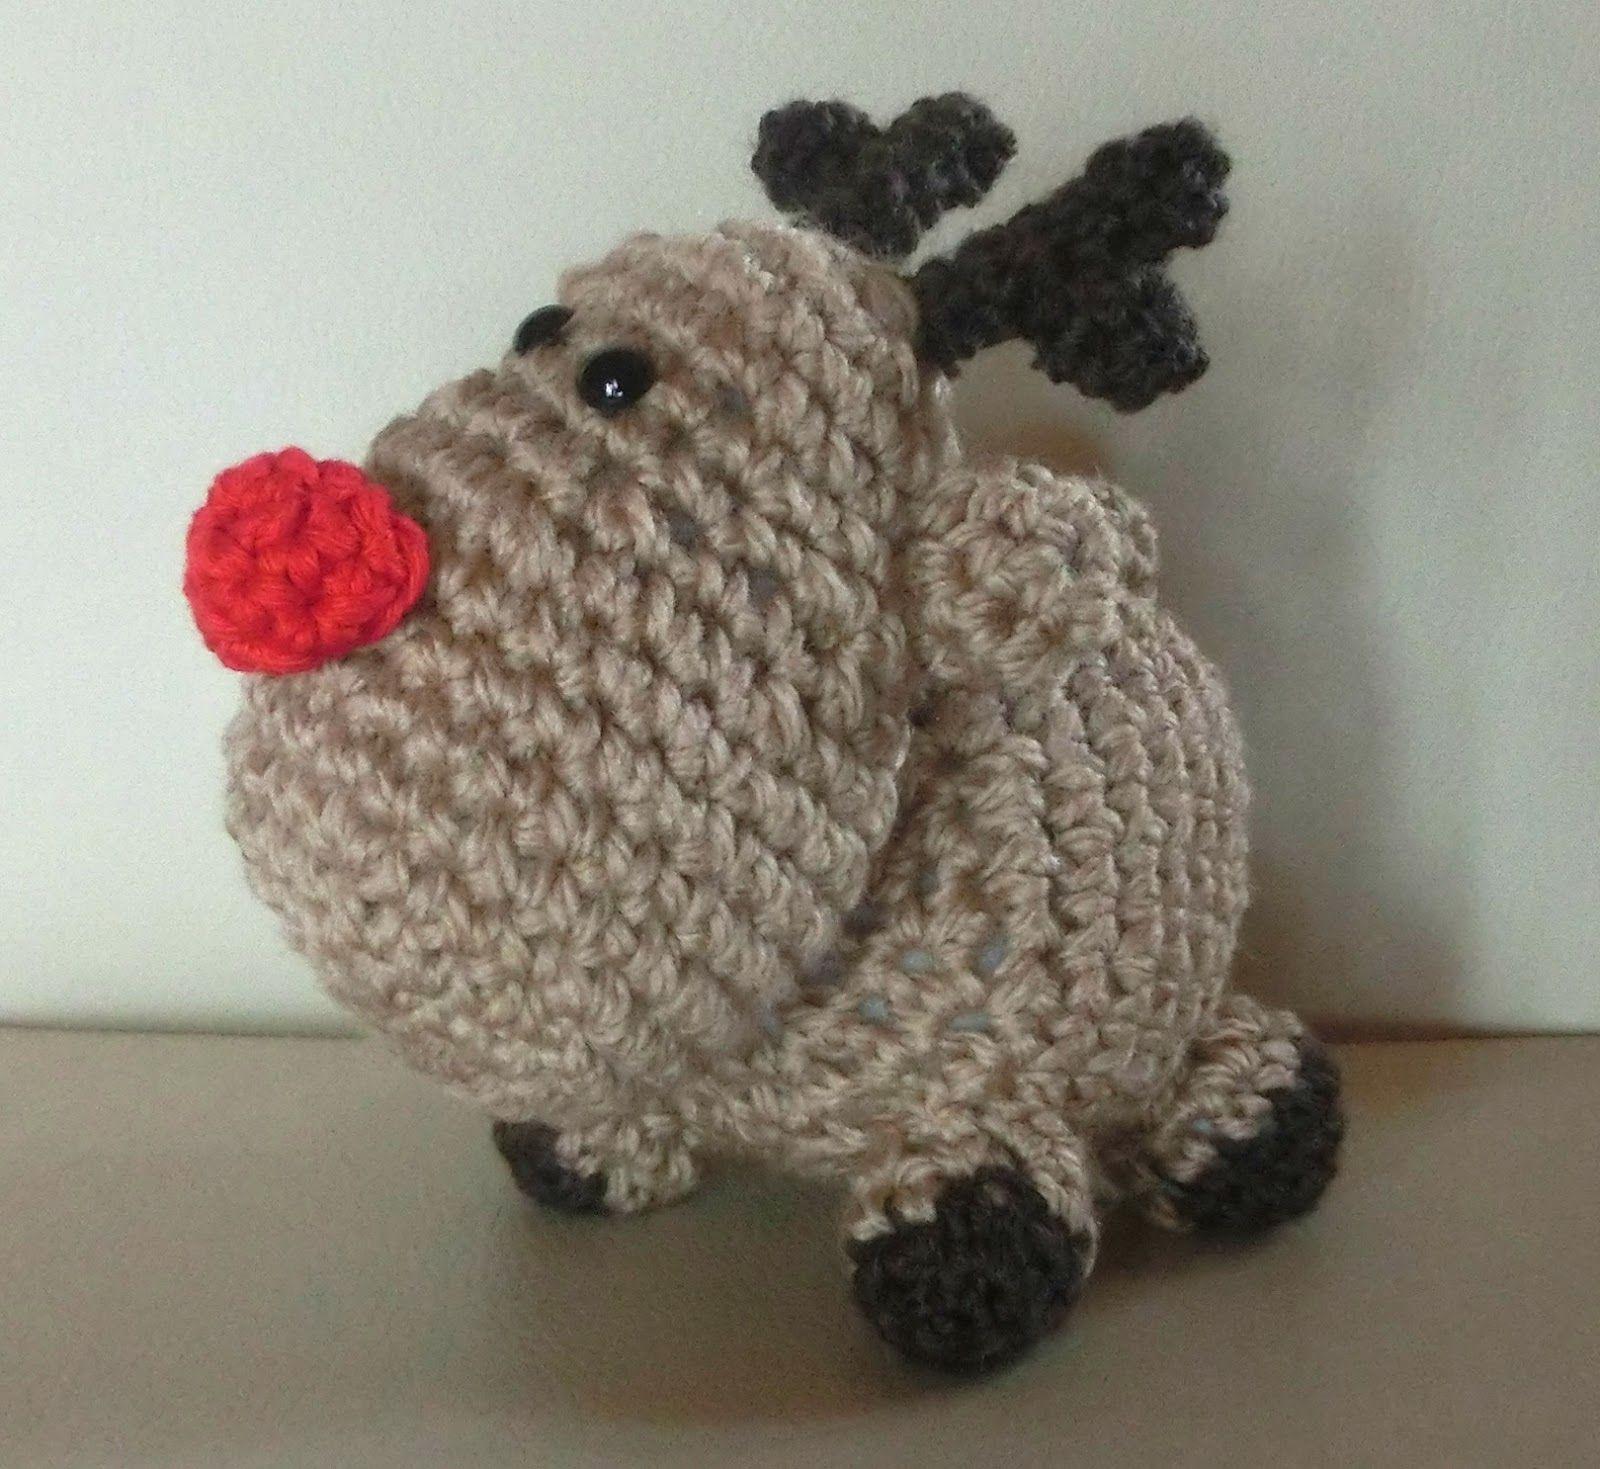 Wollowbies Häkelminis Feiern Weihnachten Jana Ganseforth Topp